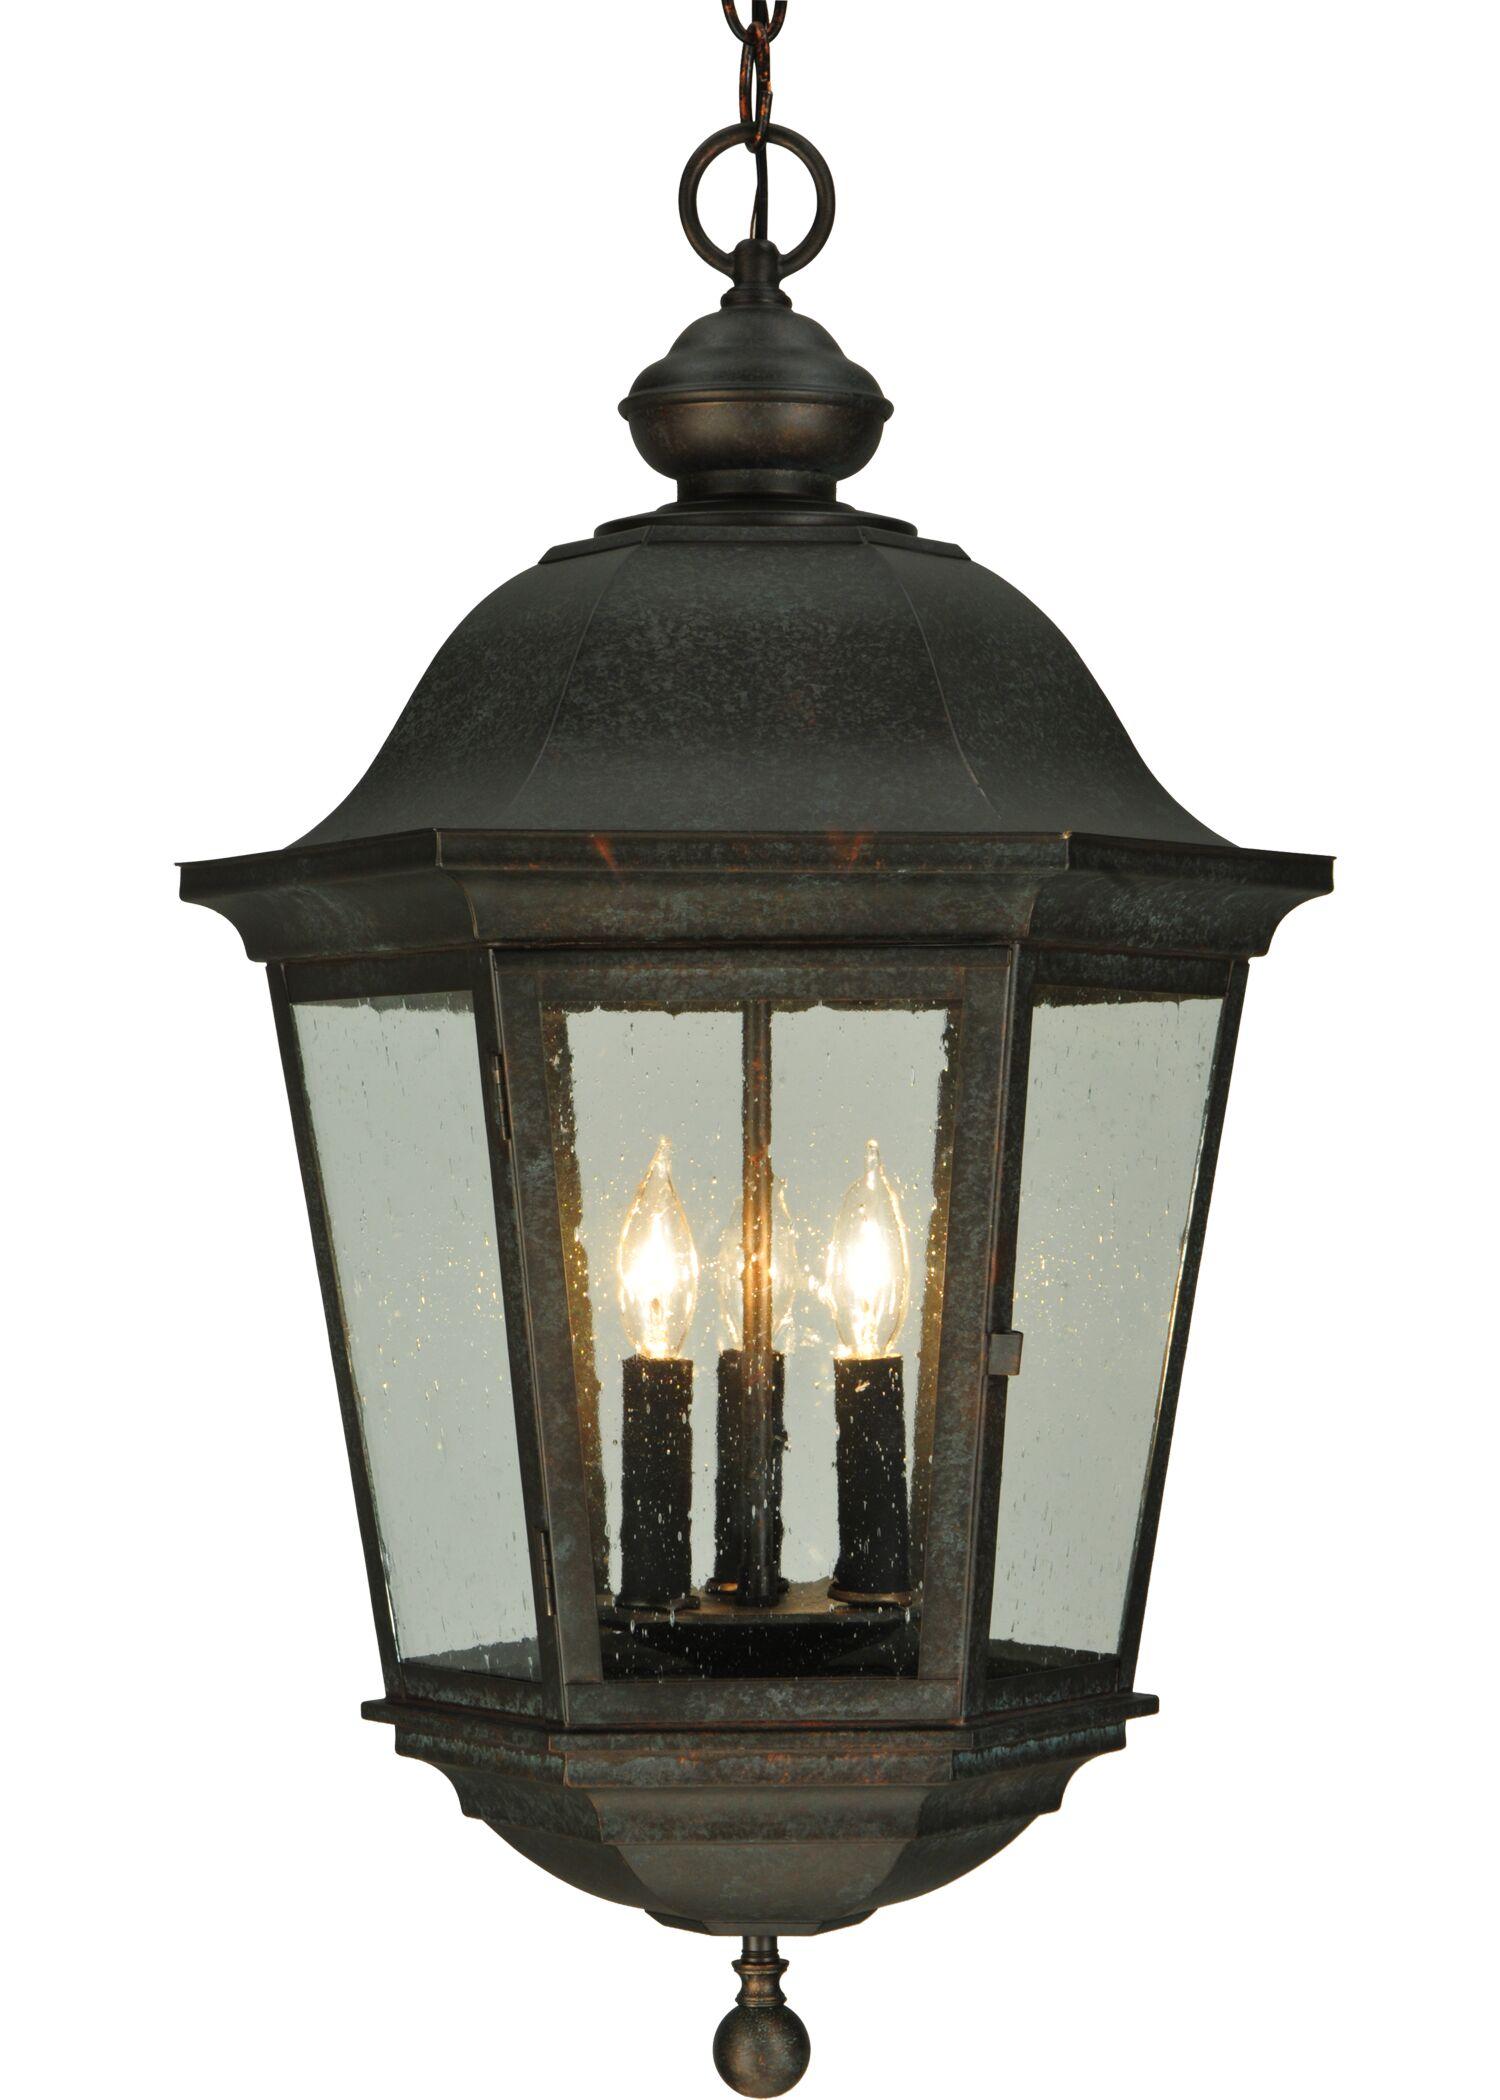 Tiamo 3-Light Foyer Pendant